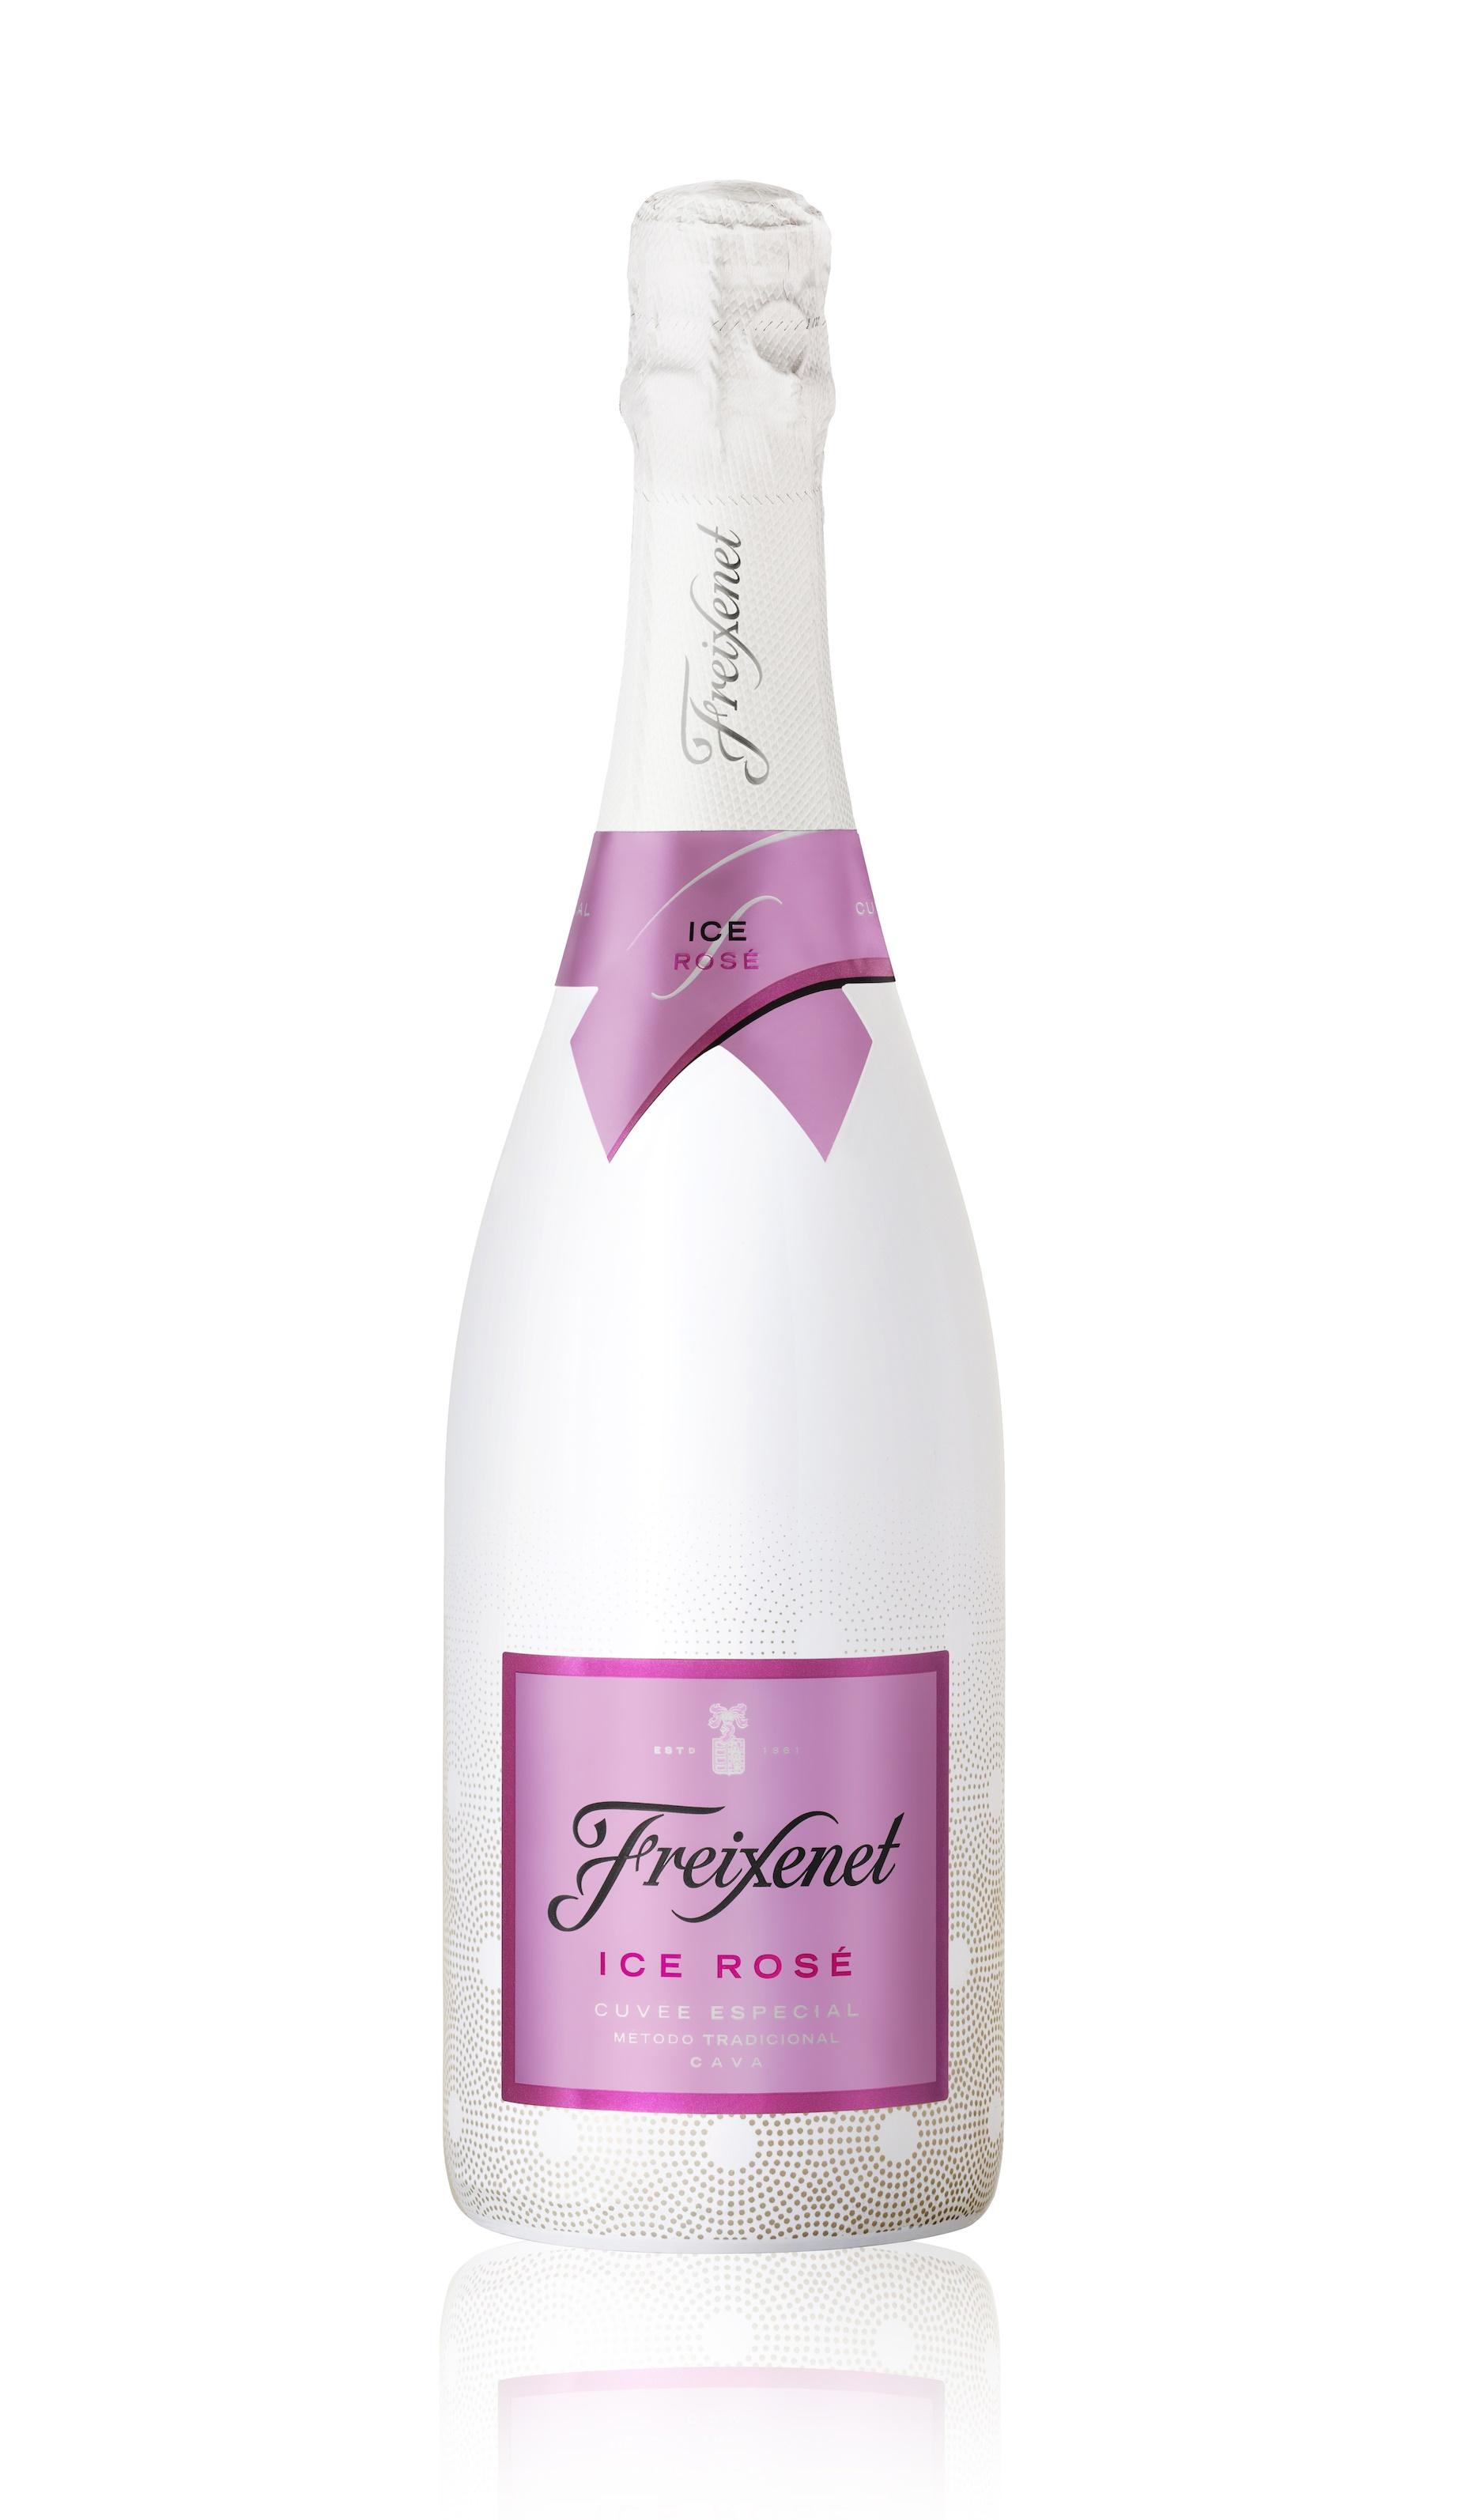 Prosecco Sparkling Wine Drinks